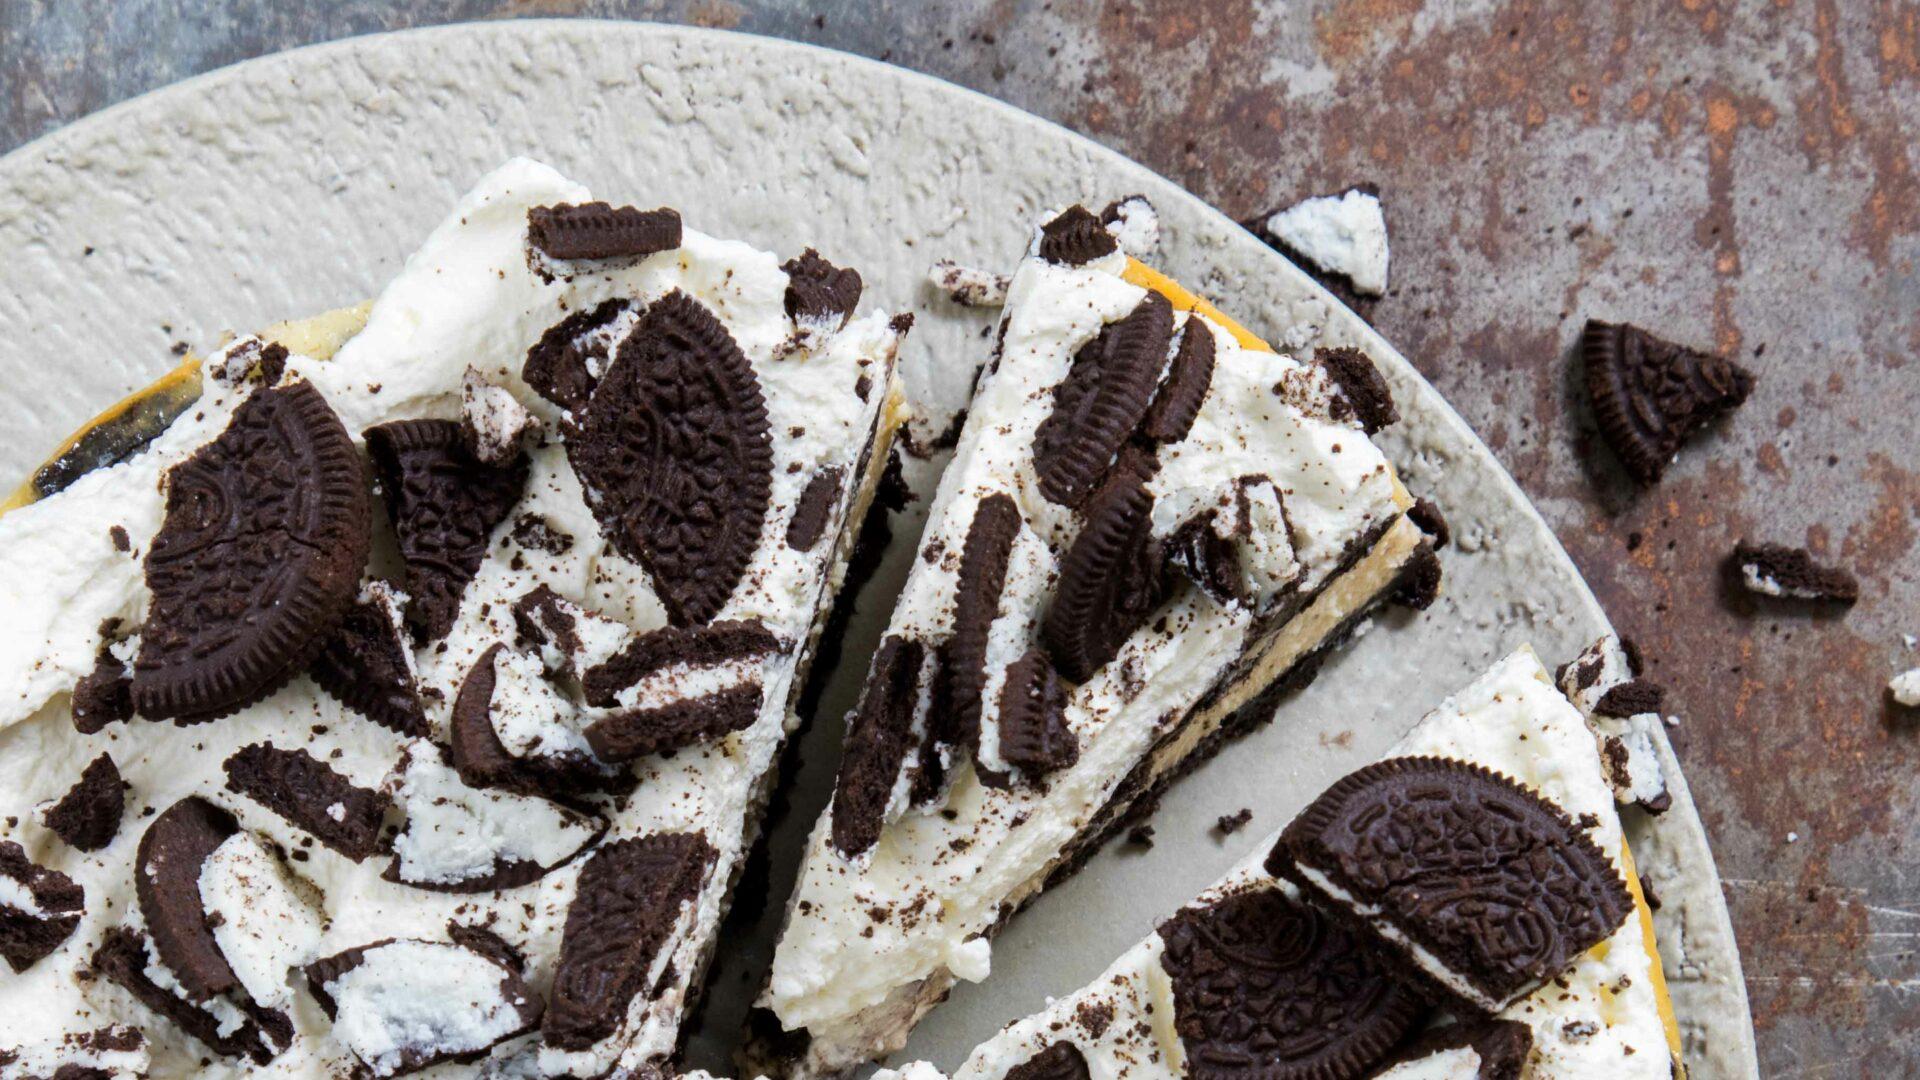 Super De lekkerste oreo cheesecake – recept - Rutger Bakt TN-93